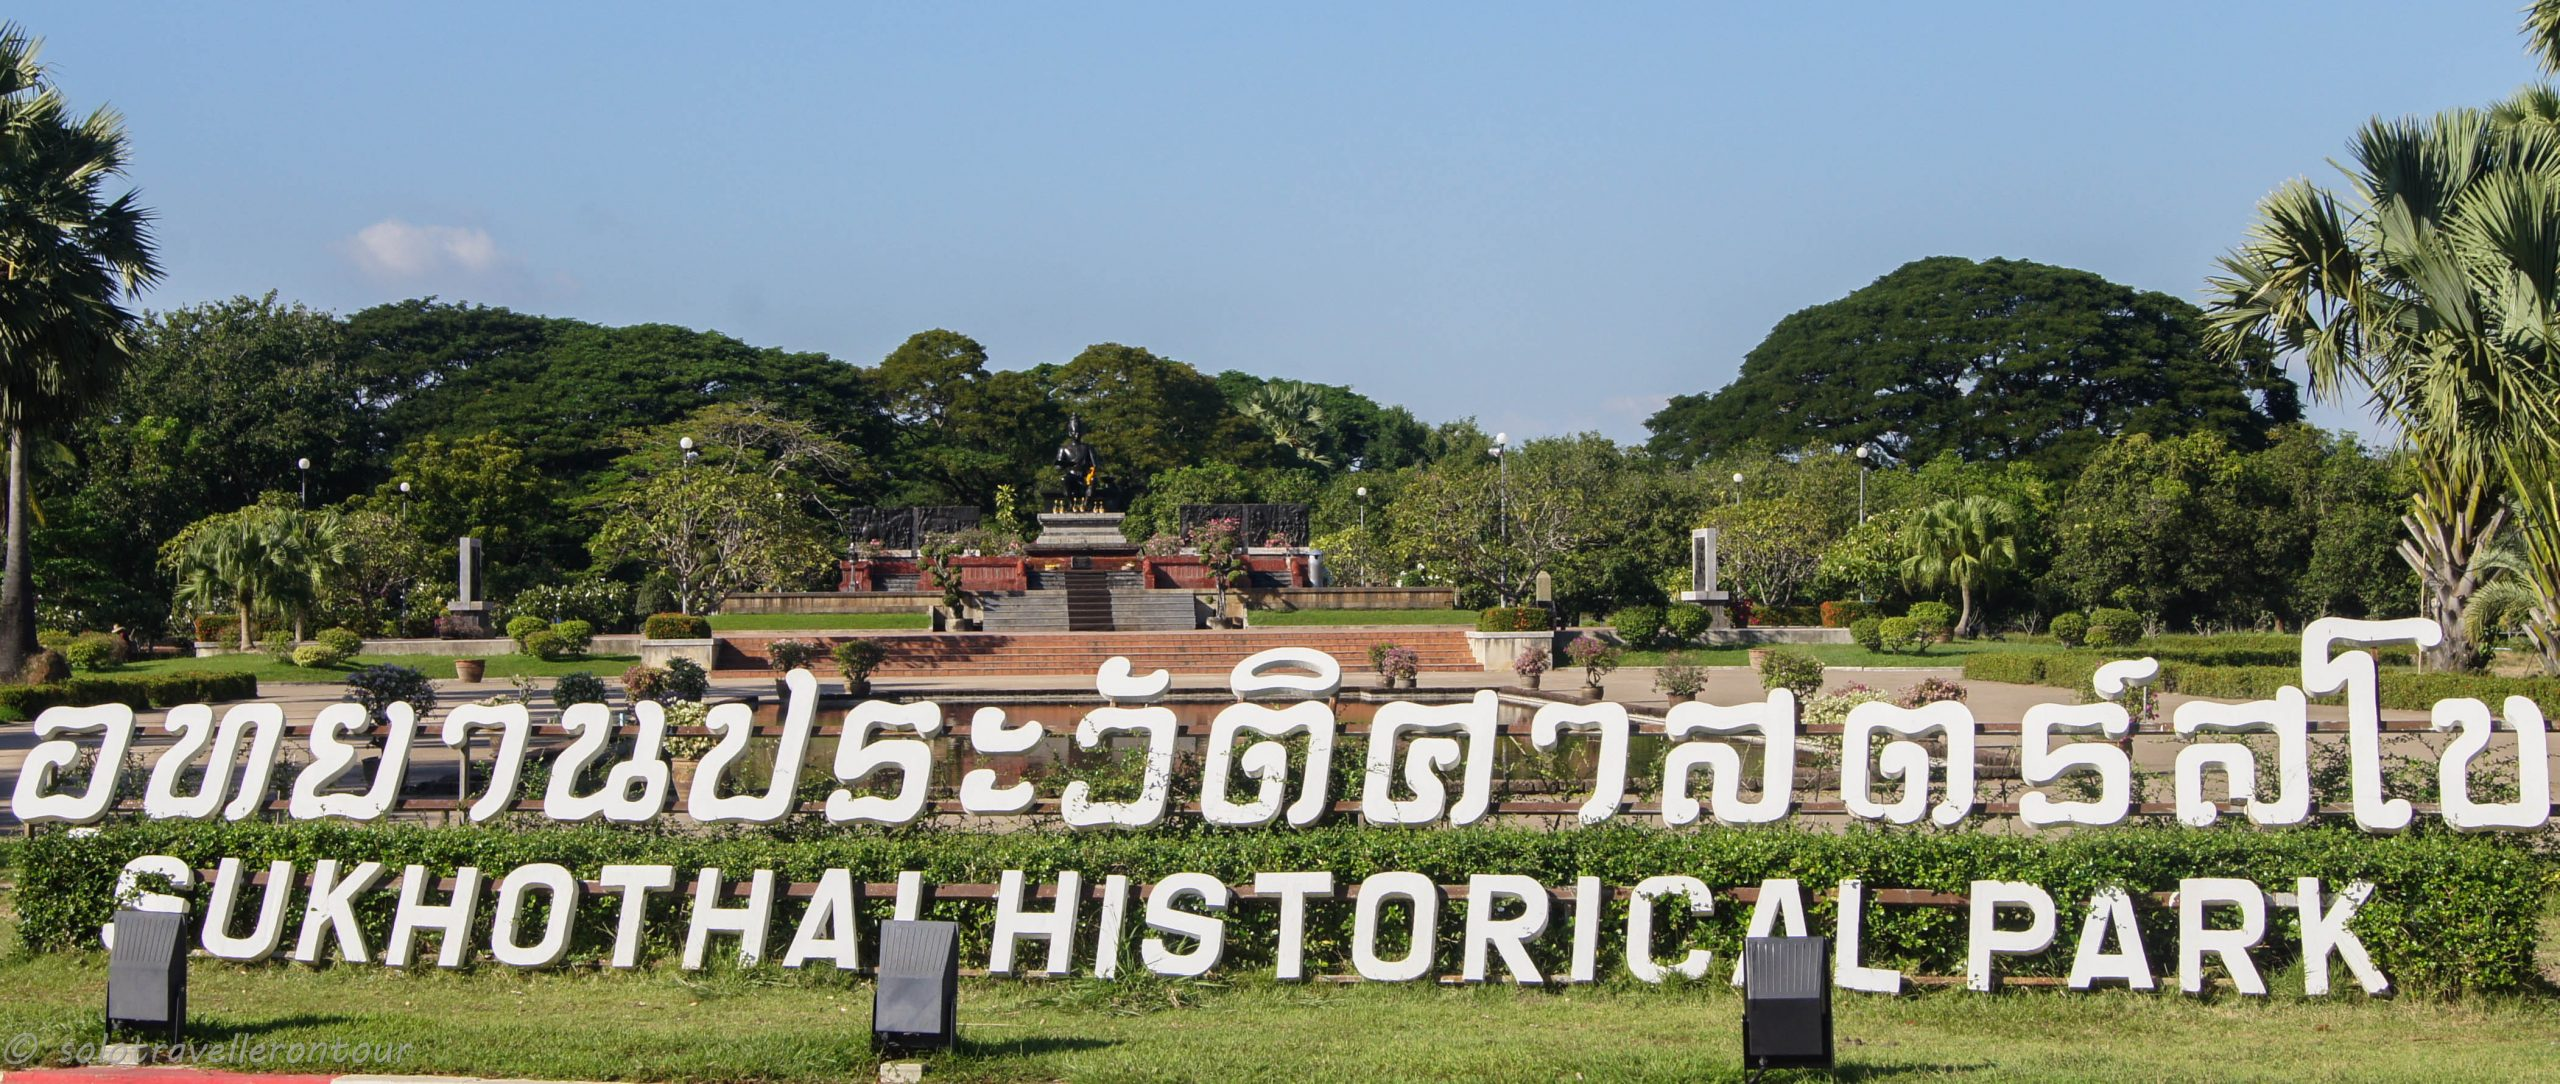 3. Blue Hawaii in Sukhothai